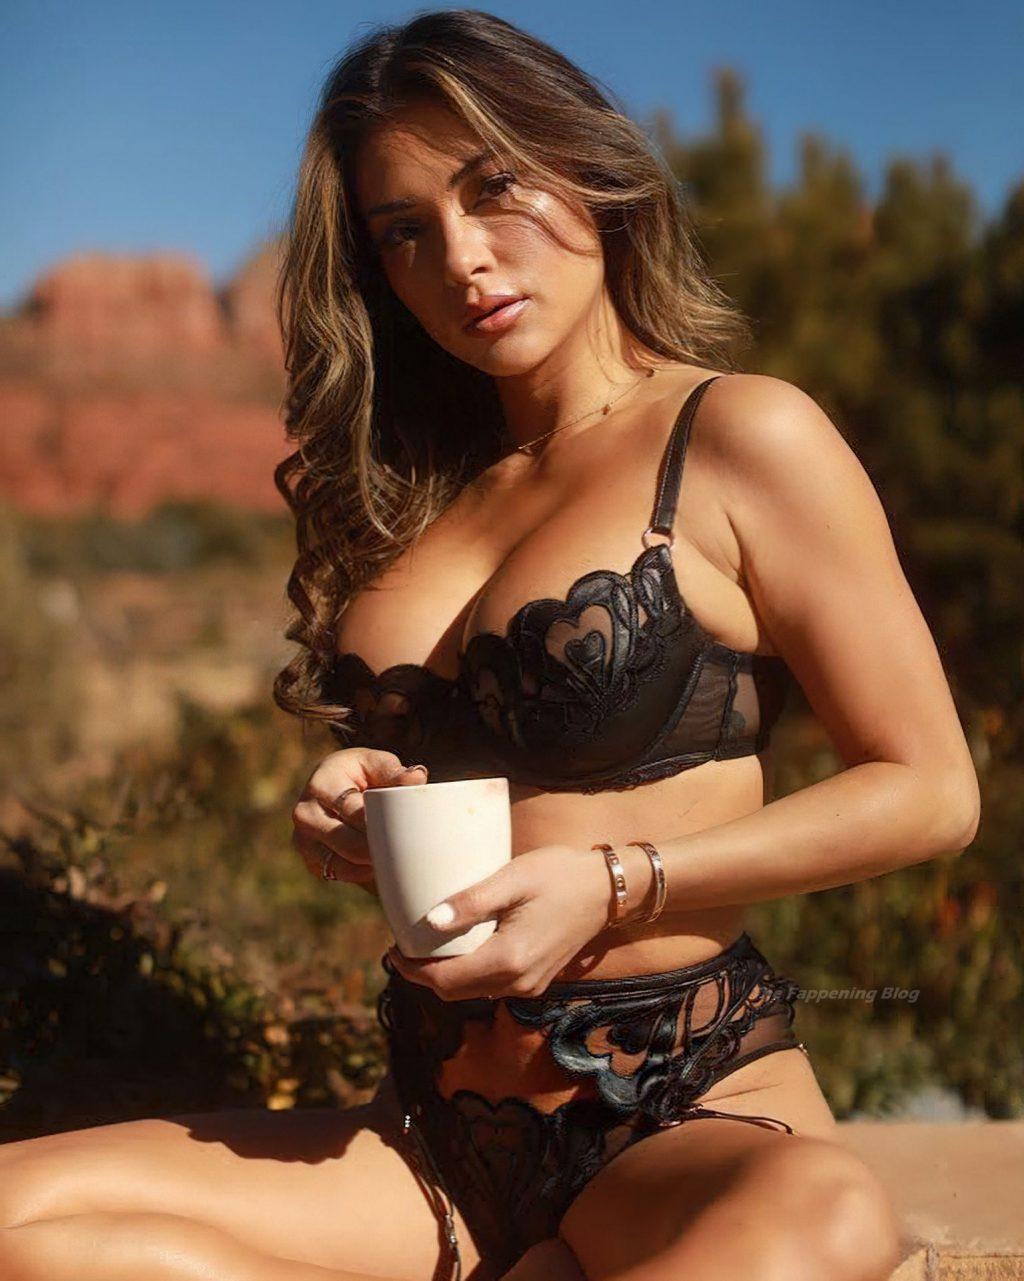 Ariadny Celeste Sexy (2 Photos)